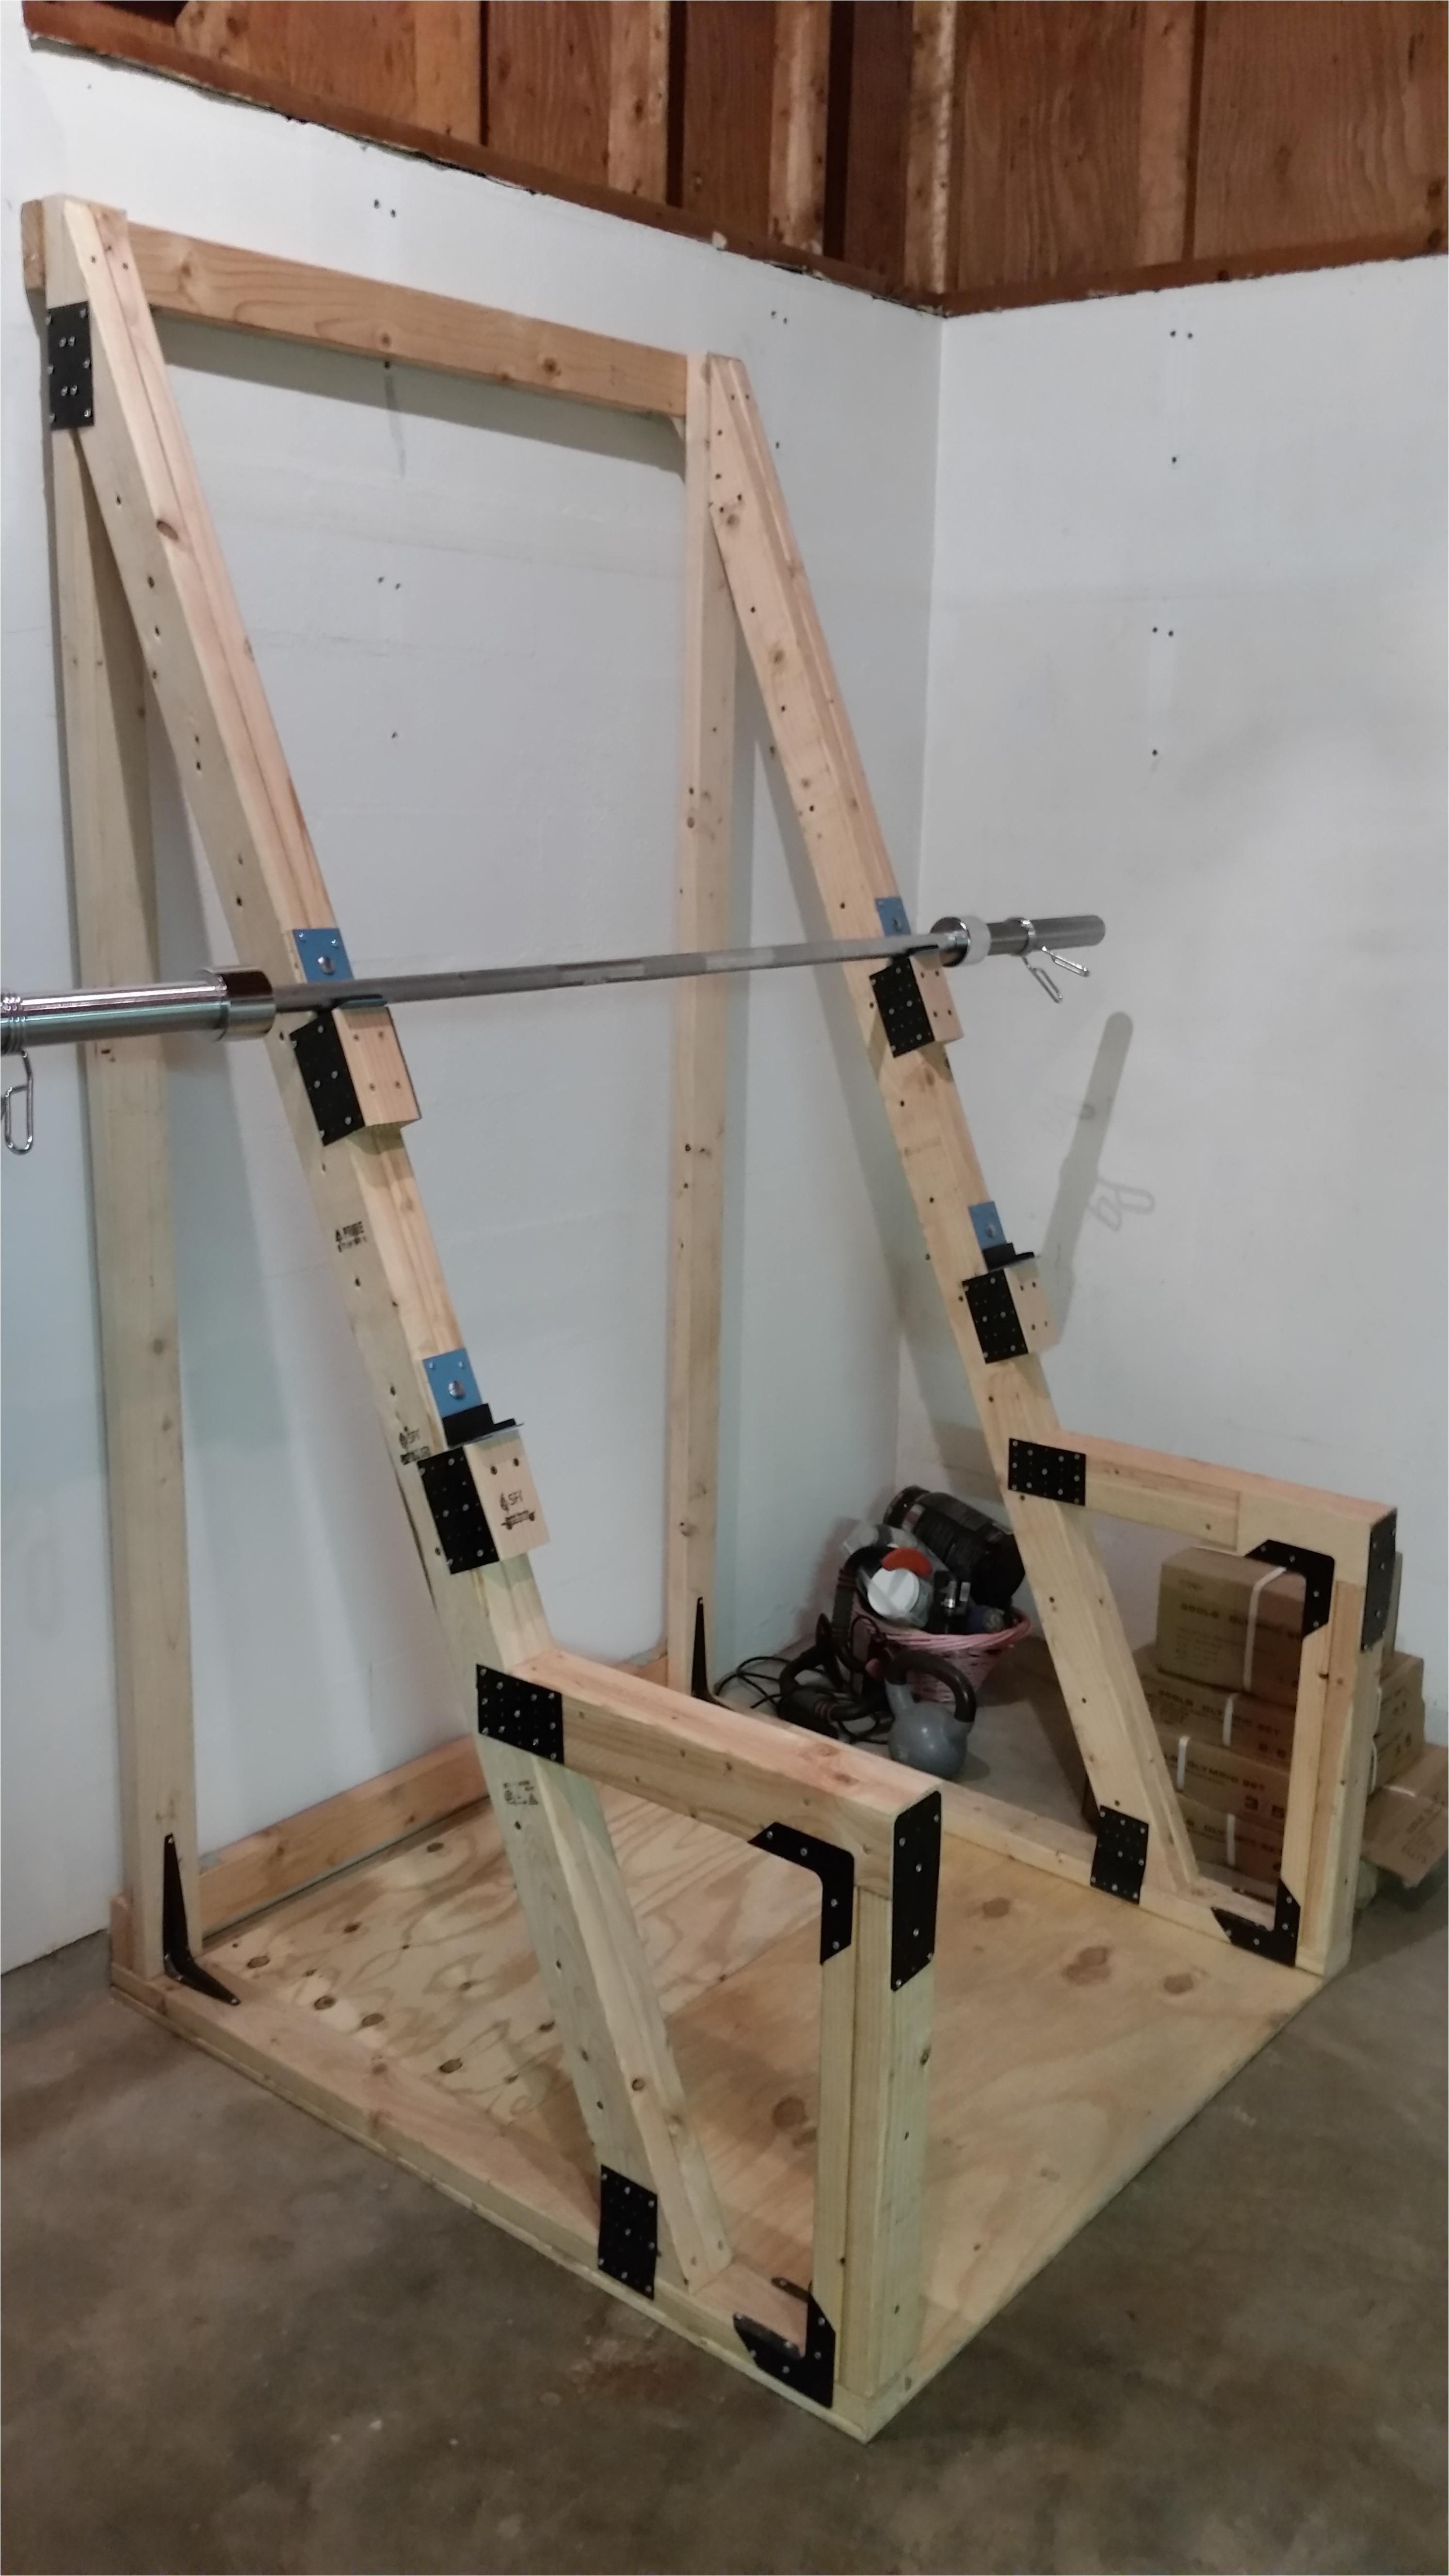 Build Your Own Wooden Squat Rack Diy Squat Rack Garage Ideas Pinterest Squat Bench and Homemade